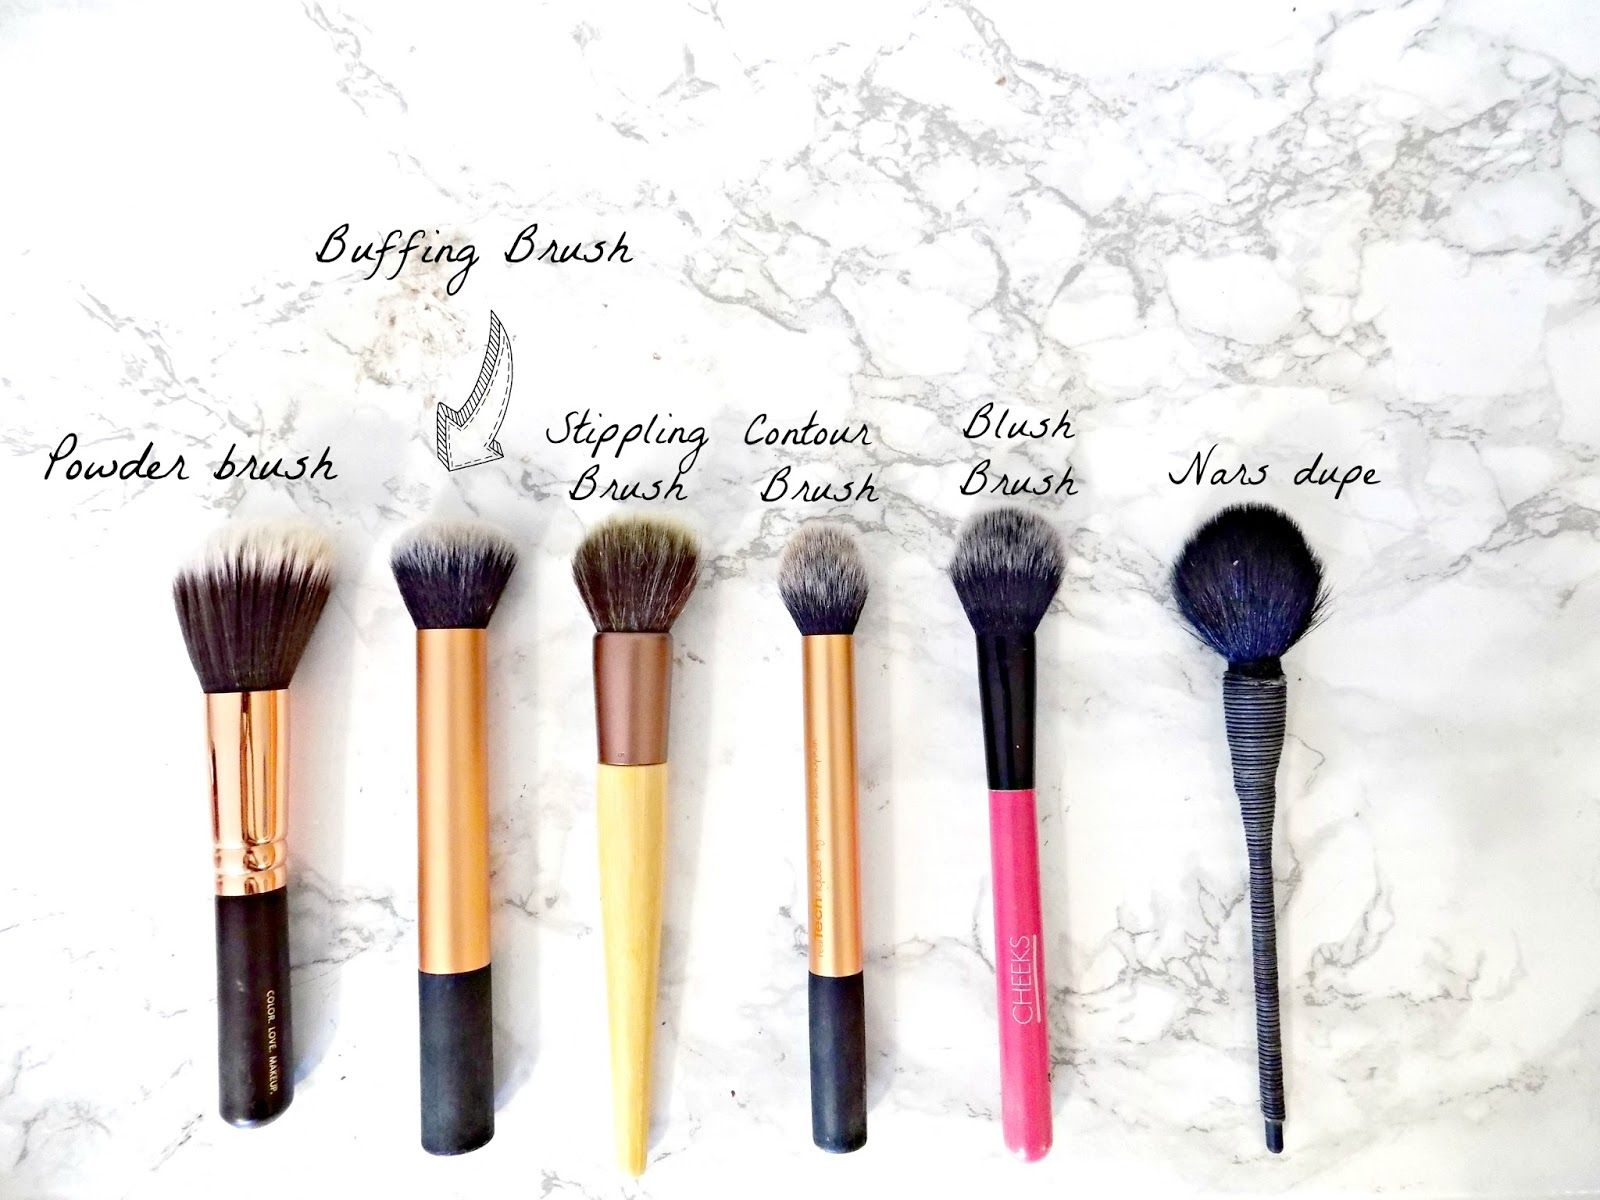 My MustHave Makeup Brushes Makeup brushes, Makeup, Brush